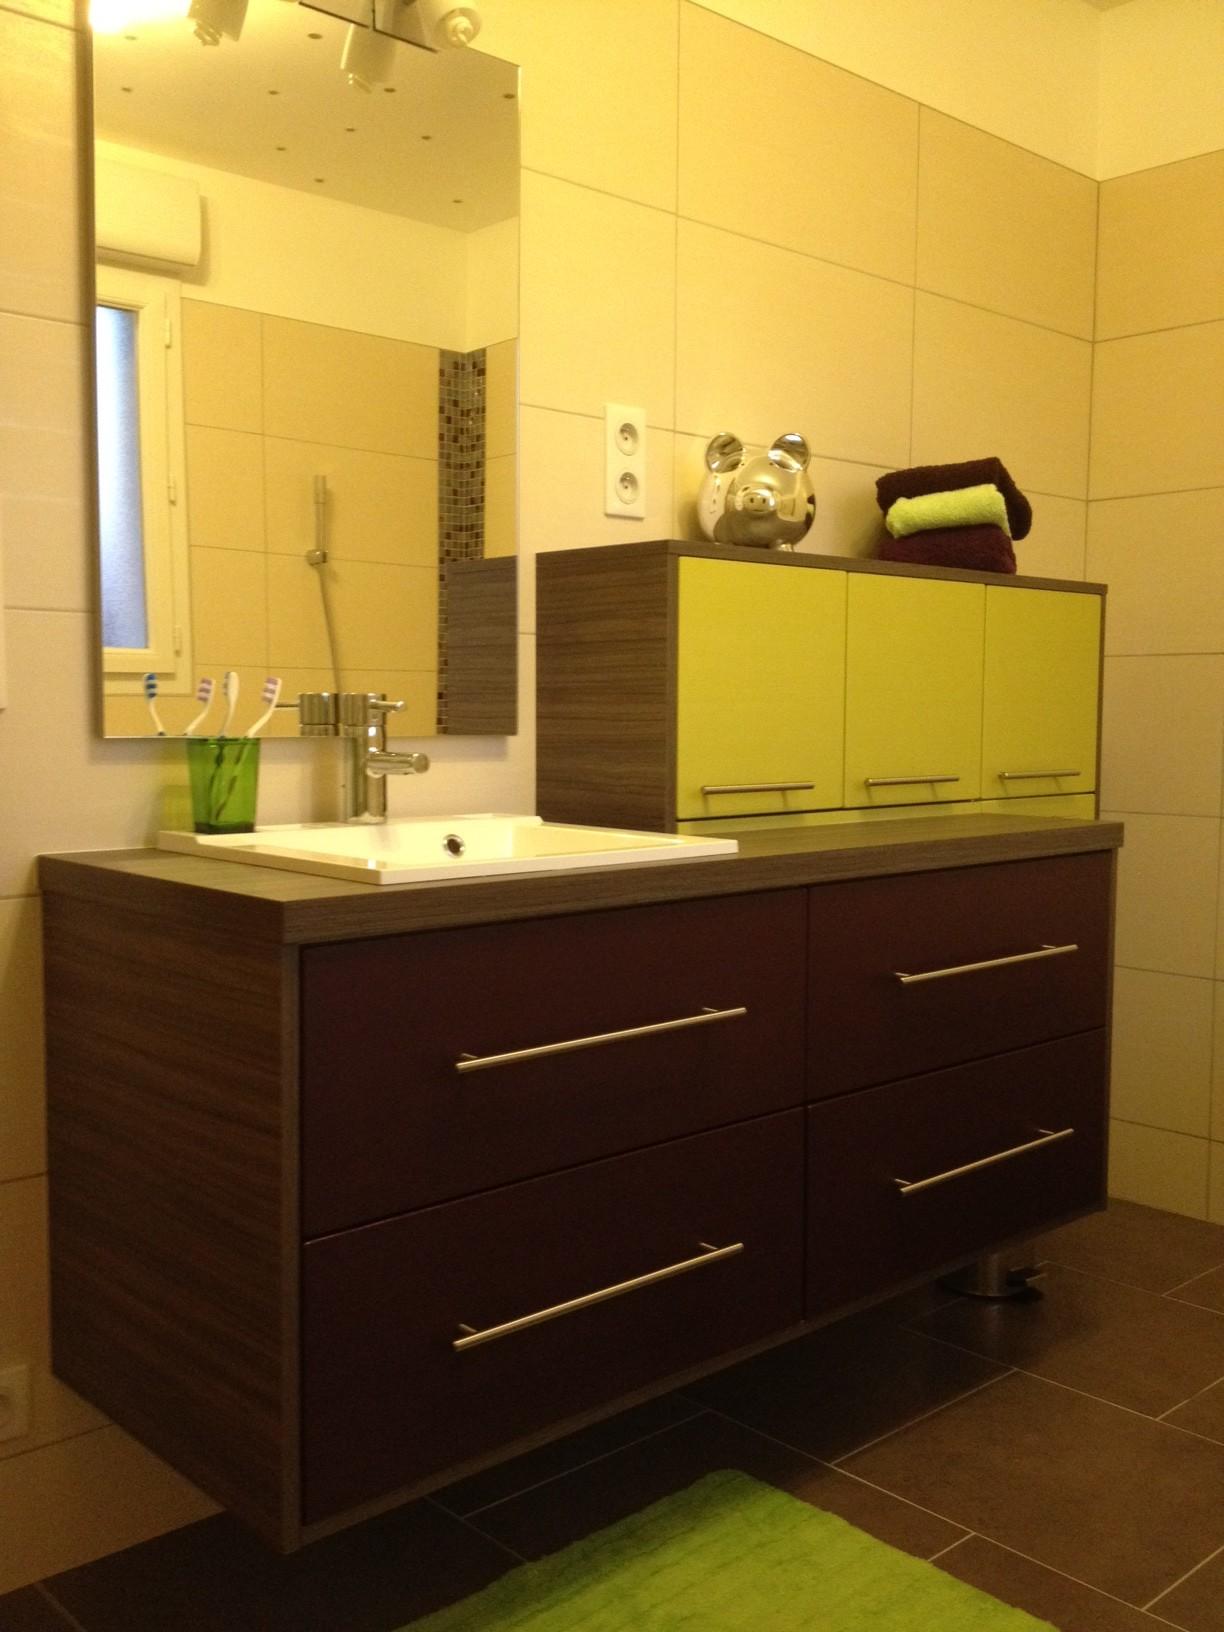 installation d une salle de bain design. Black Bedroom Furniture Sets. Home Design Ideas